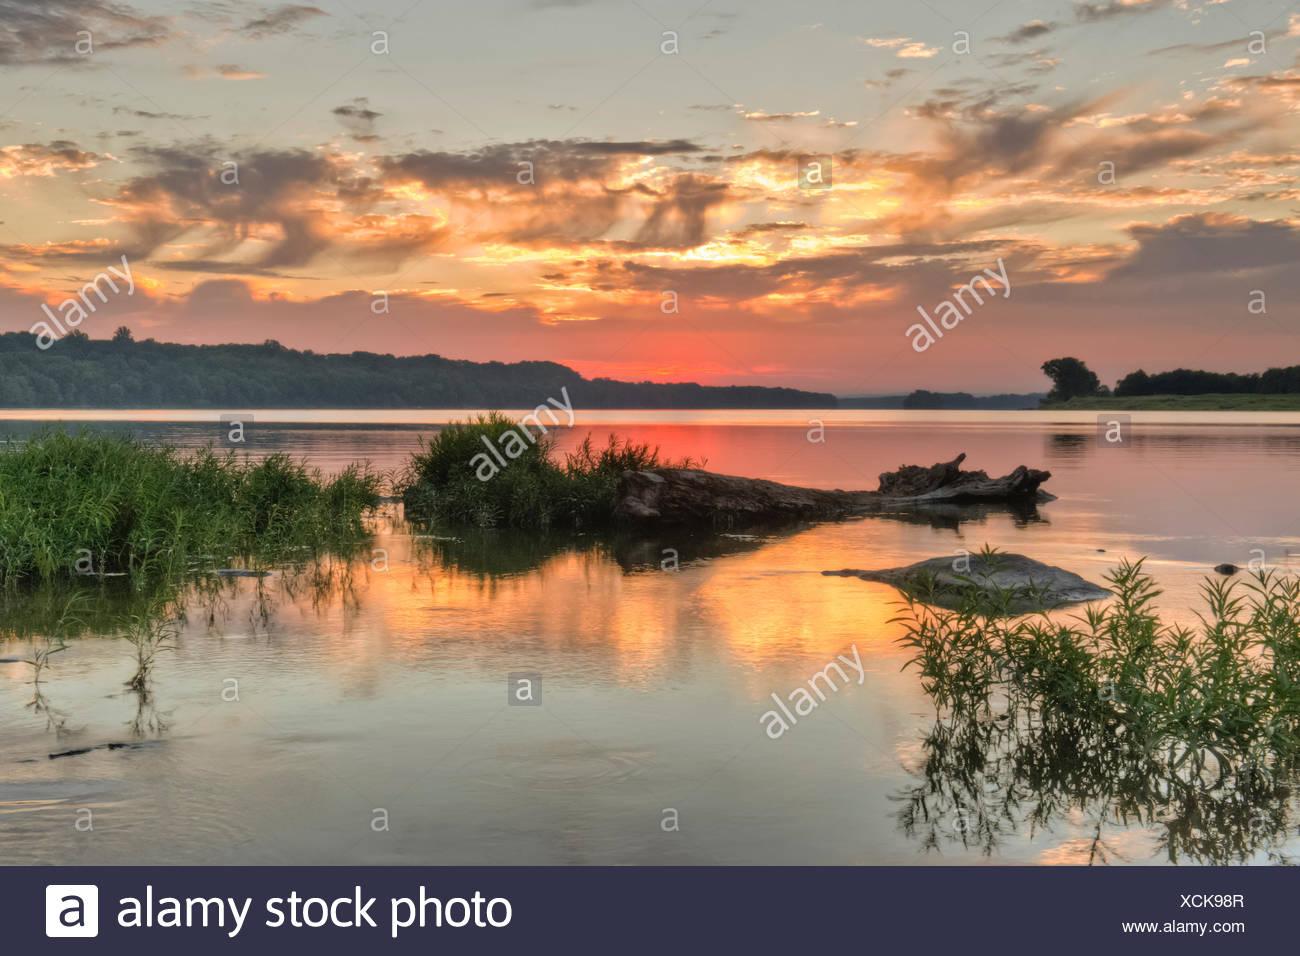 Above Seneca Breaks on the Potomac River, at sunset. - Stock Image